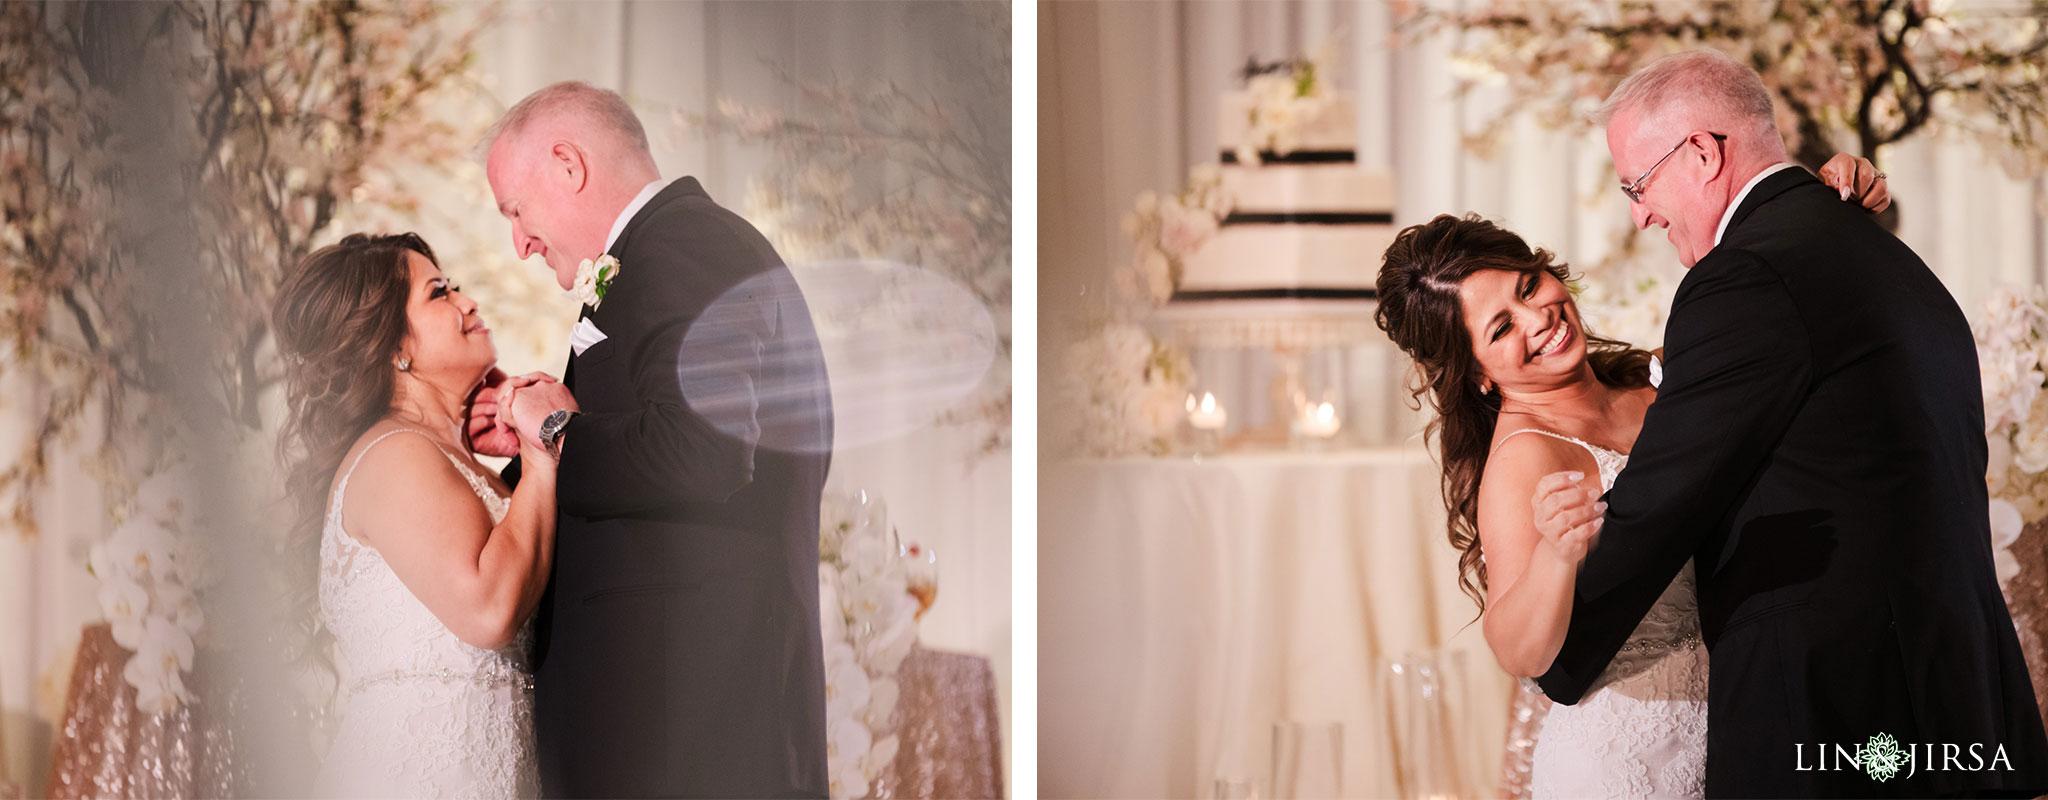 22 venue by three petals huntington beach wedding photography 1